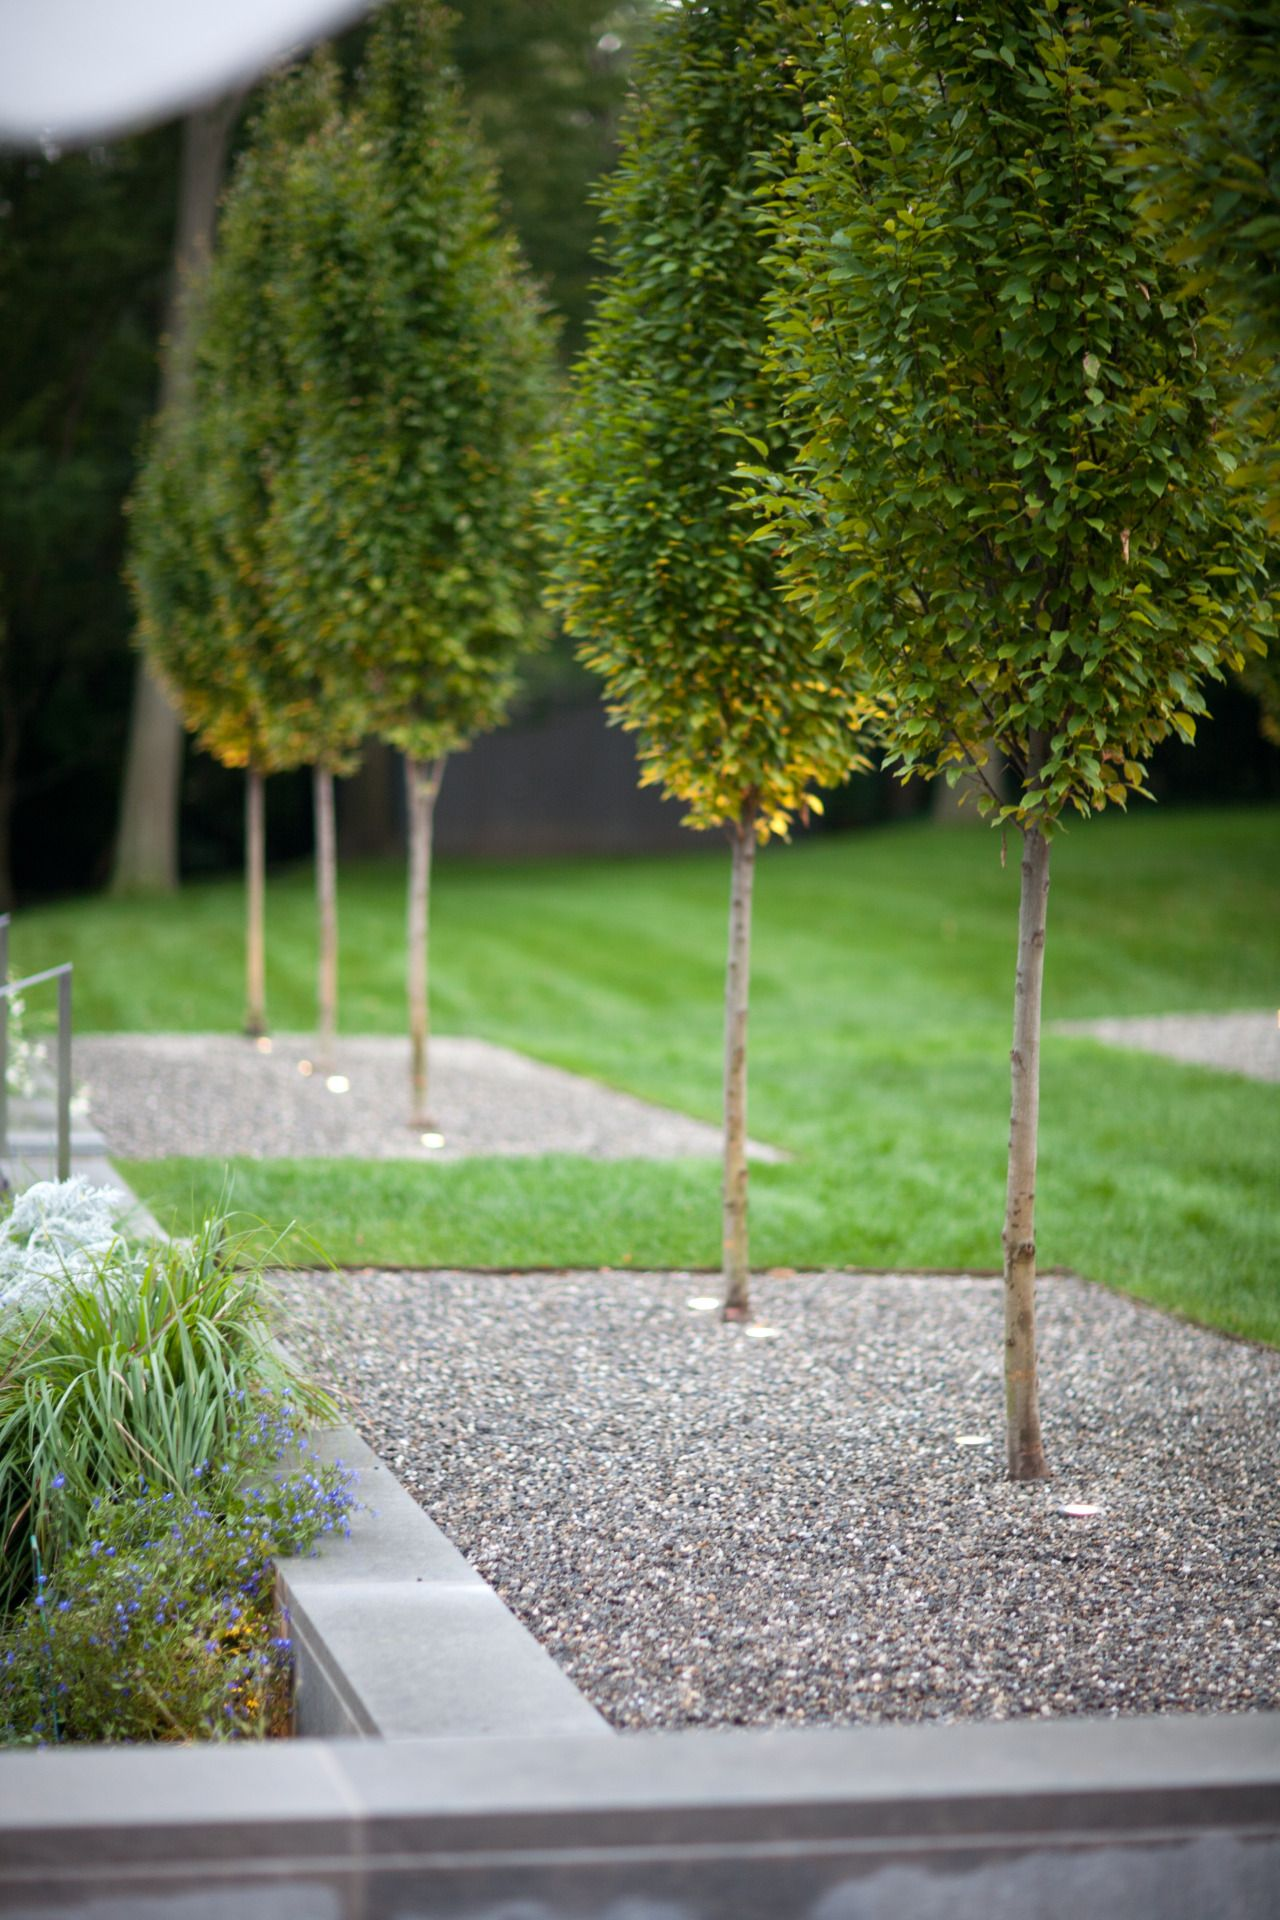 Hornbeams gravel doyle herman design associates for Landscape design associates